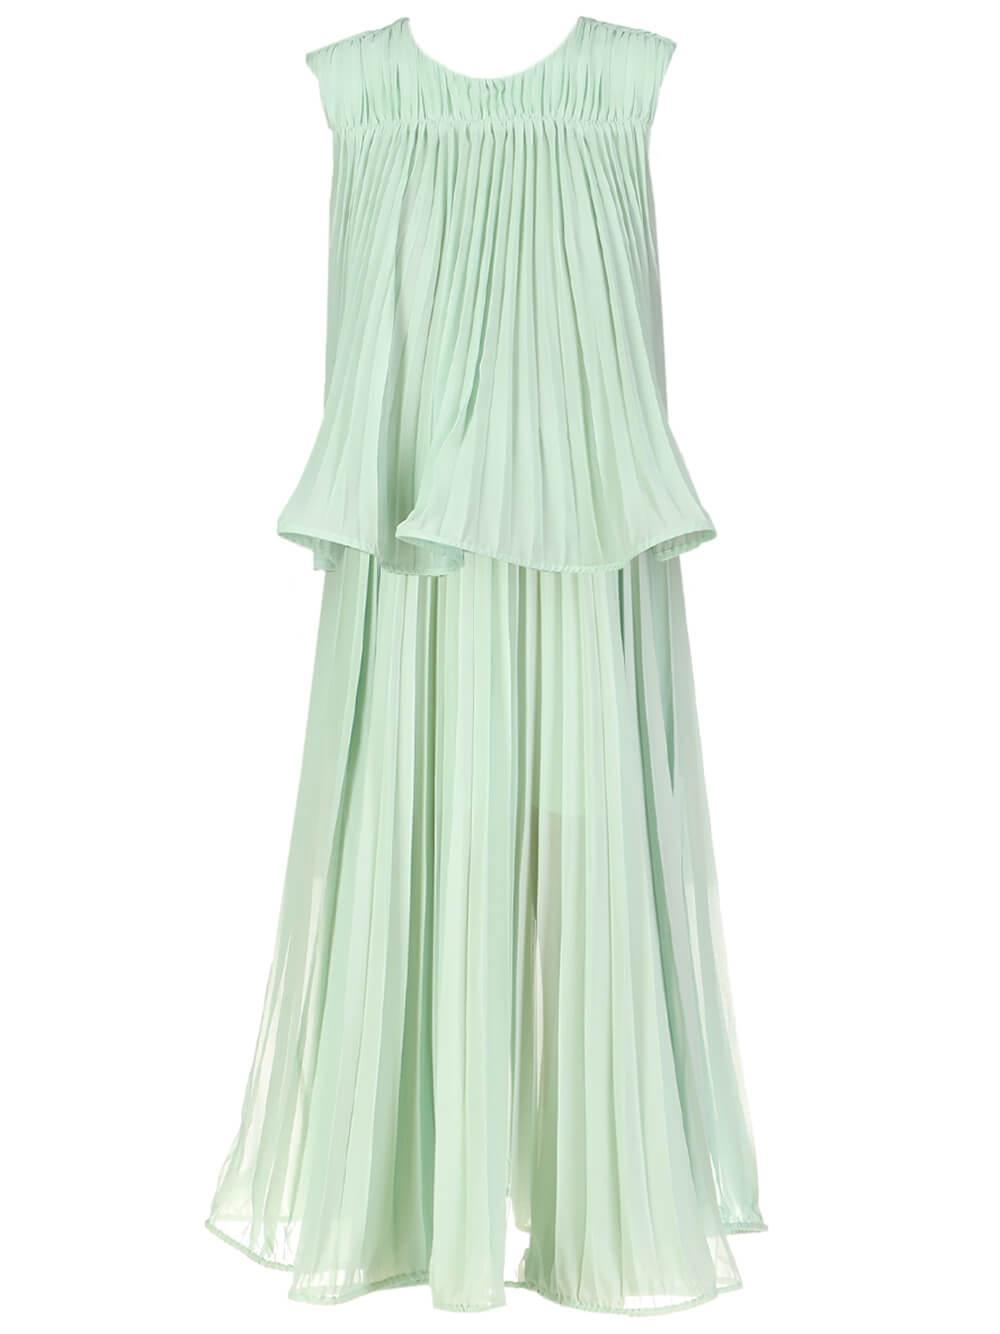 Arlette Dress Item # 5814465